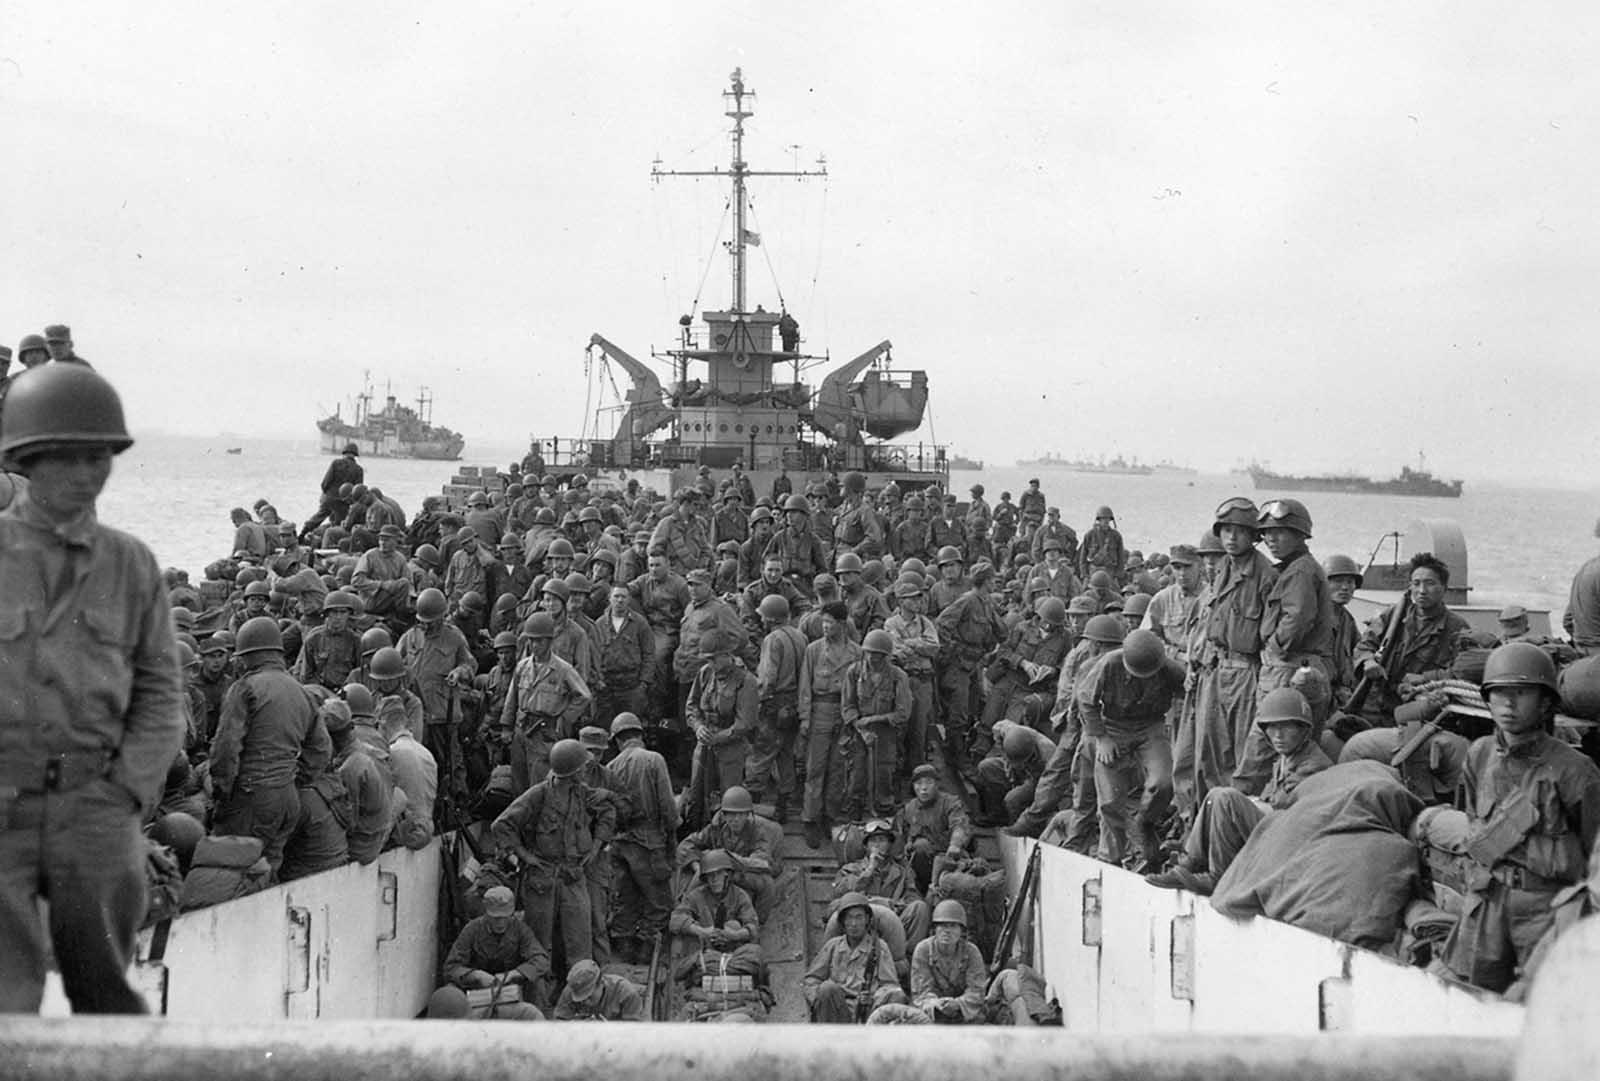 Troops of the 31st Infantry Regiment land at Inchon Harbor, Korea, aboard LSTs on September 18, 1950.